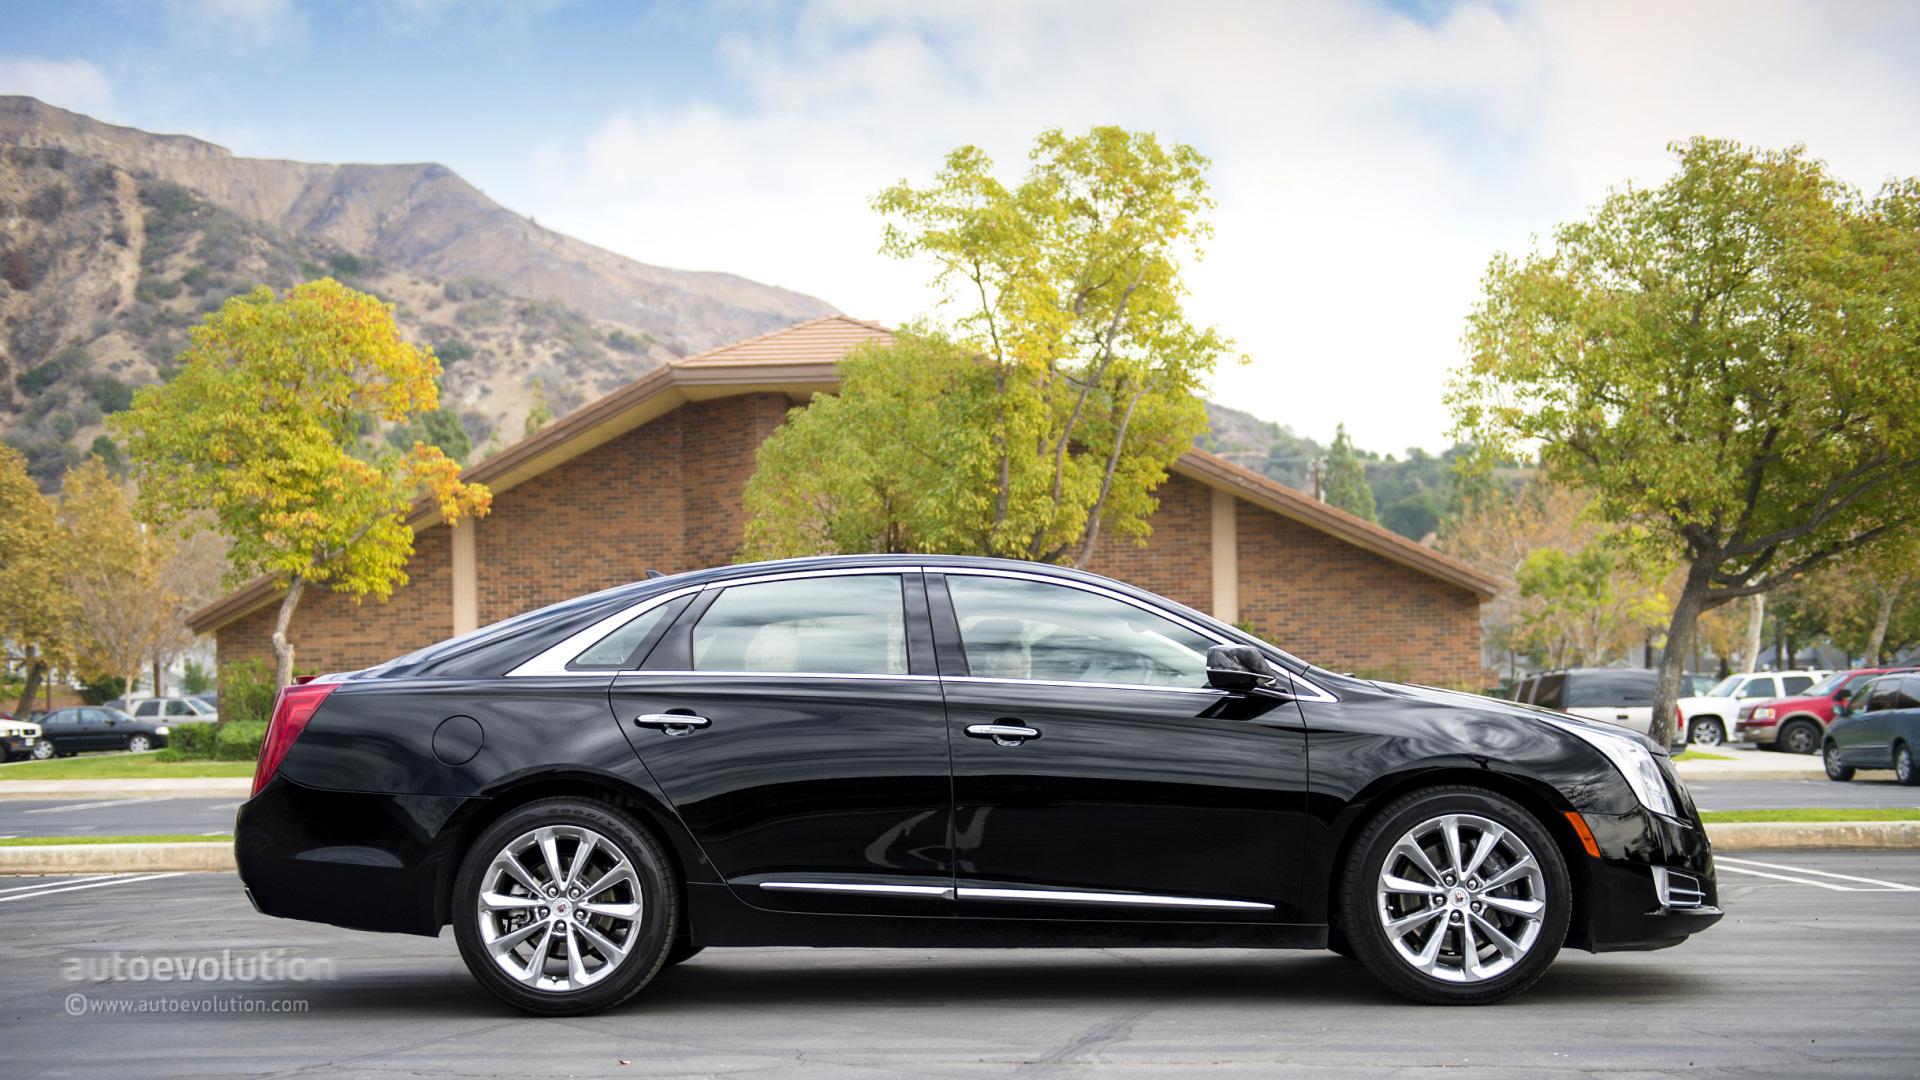 Xts Vs Cts >> Cadillac Xts Won T Be Replaced Ats And Cts To Be Renamed